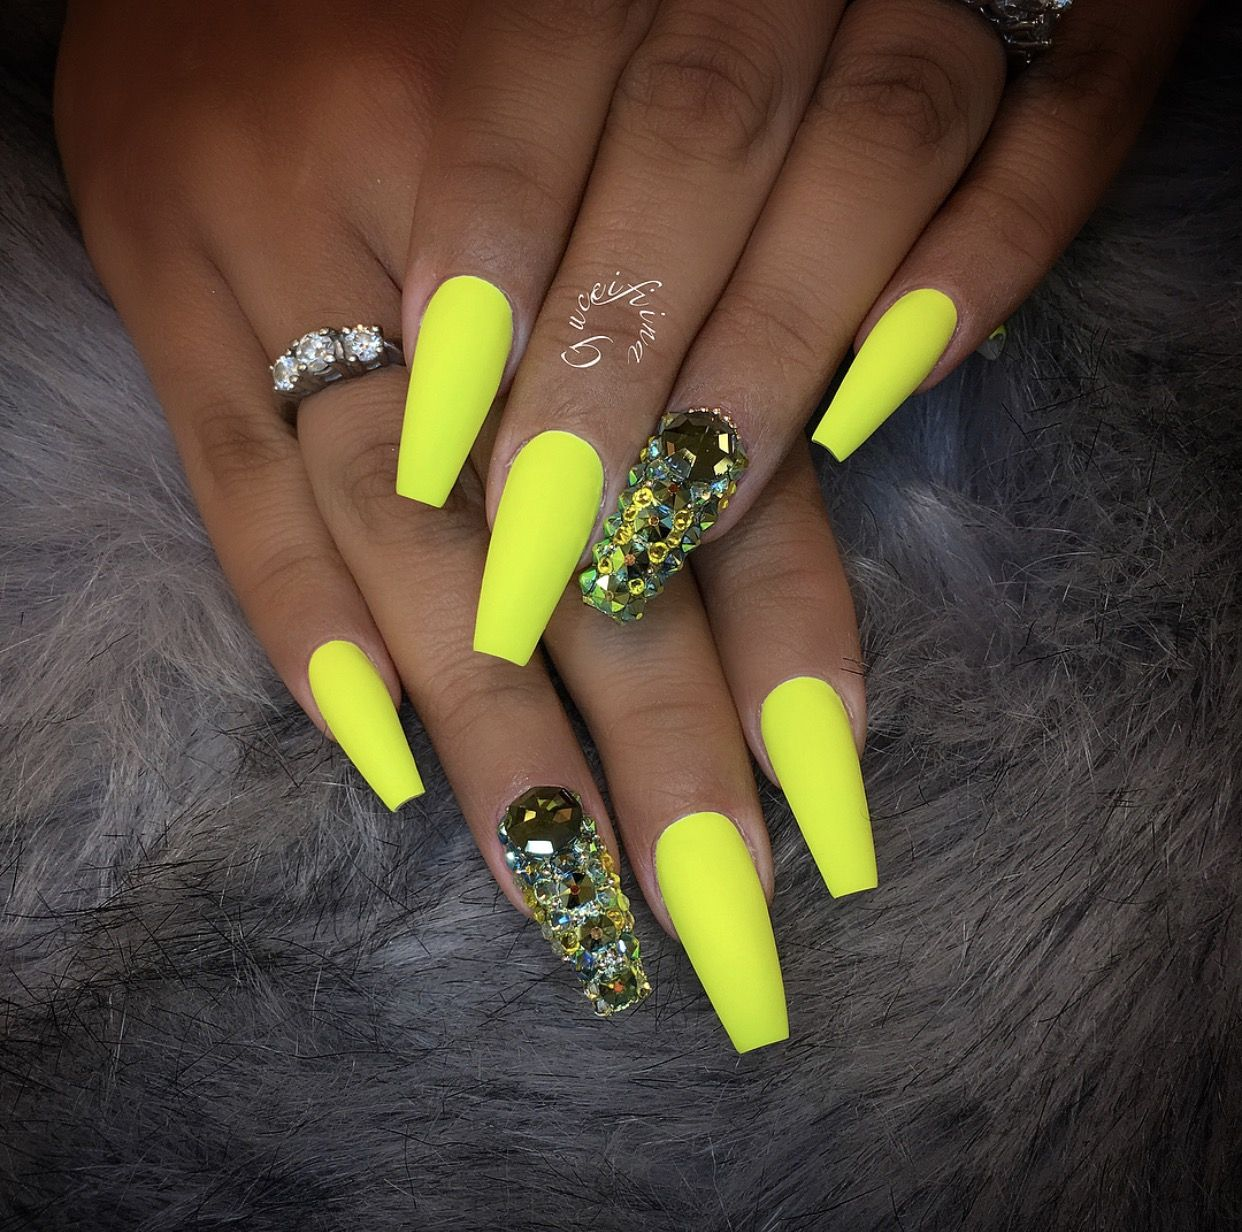 Pinterest Keishahendo Amariidanielle Neon Green Nails Yellow Nails Green Nails